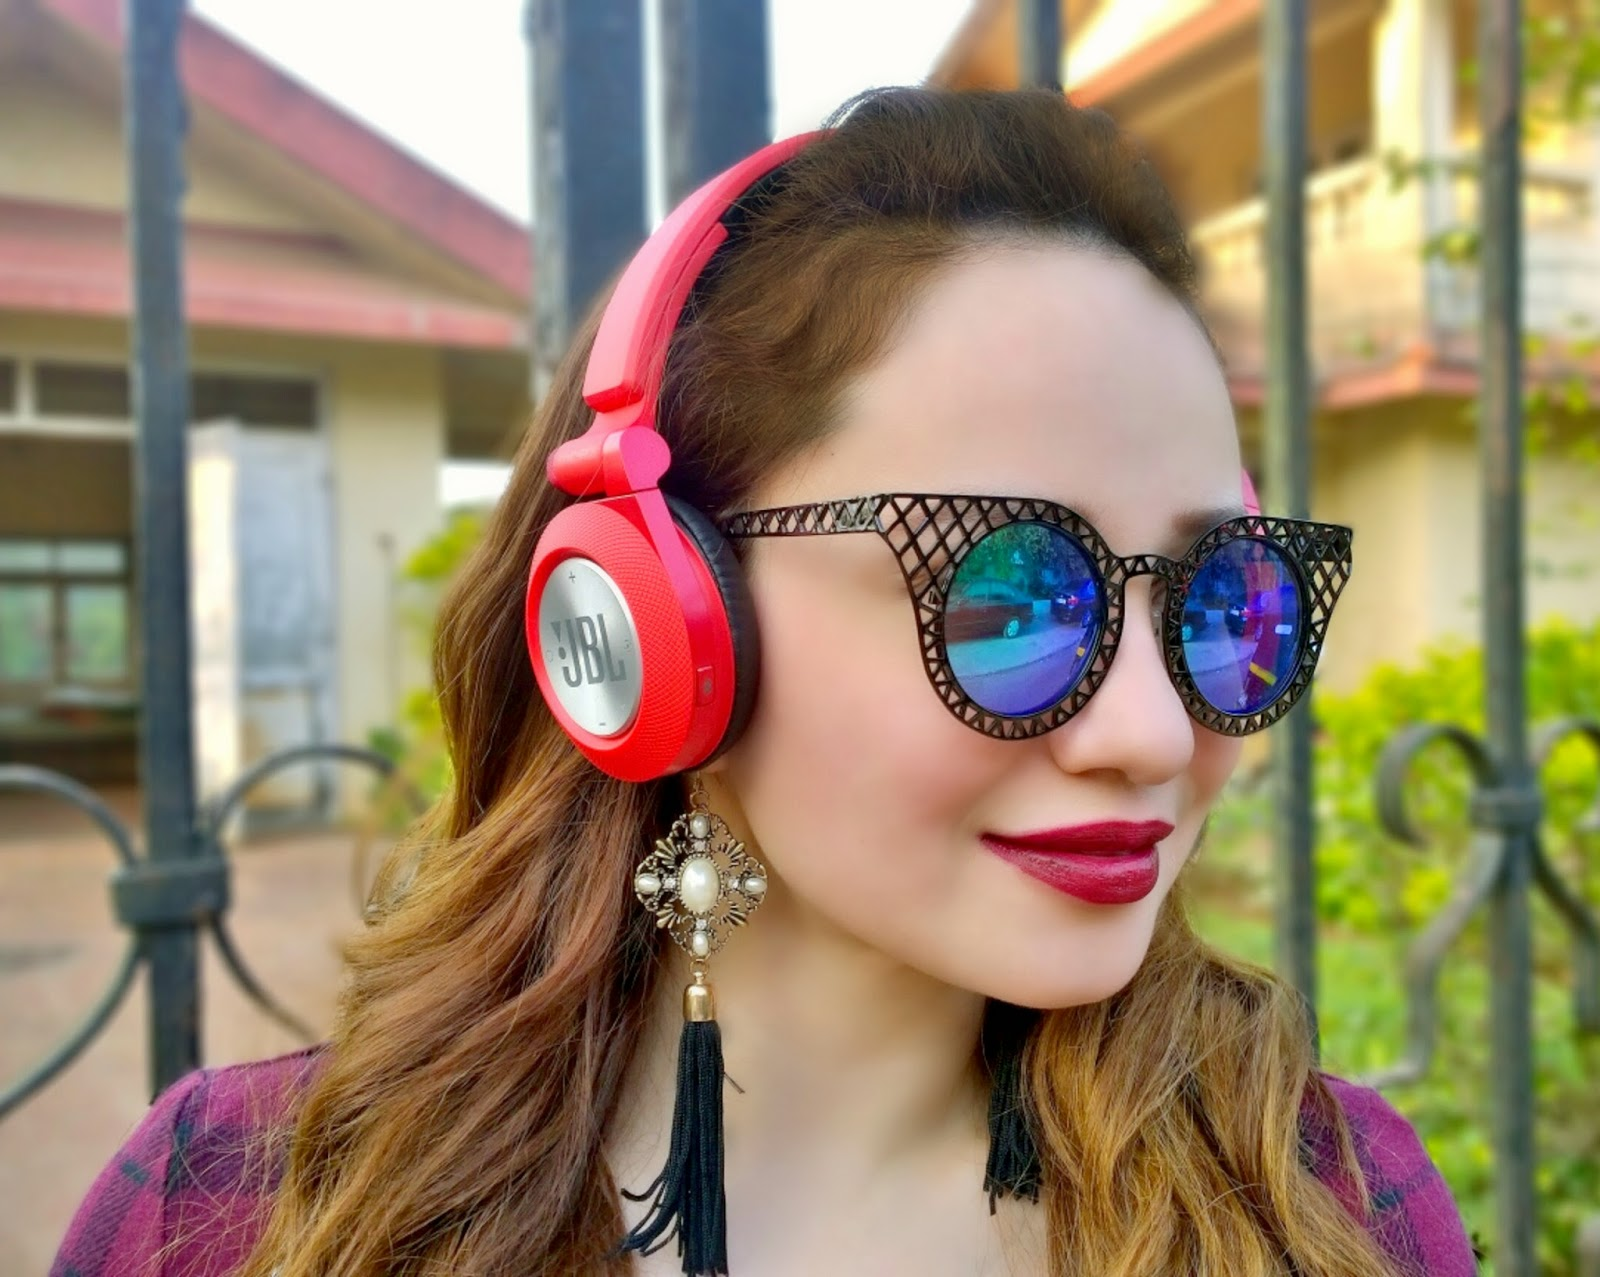 Candy Red JBL Wireless Headphones, Cat Eye Sunglasses, MAC Diva Lipstick